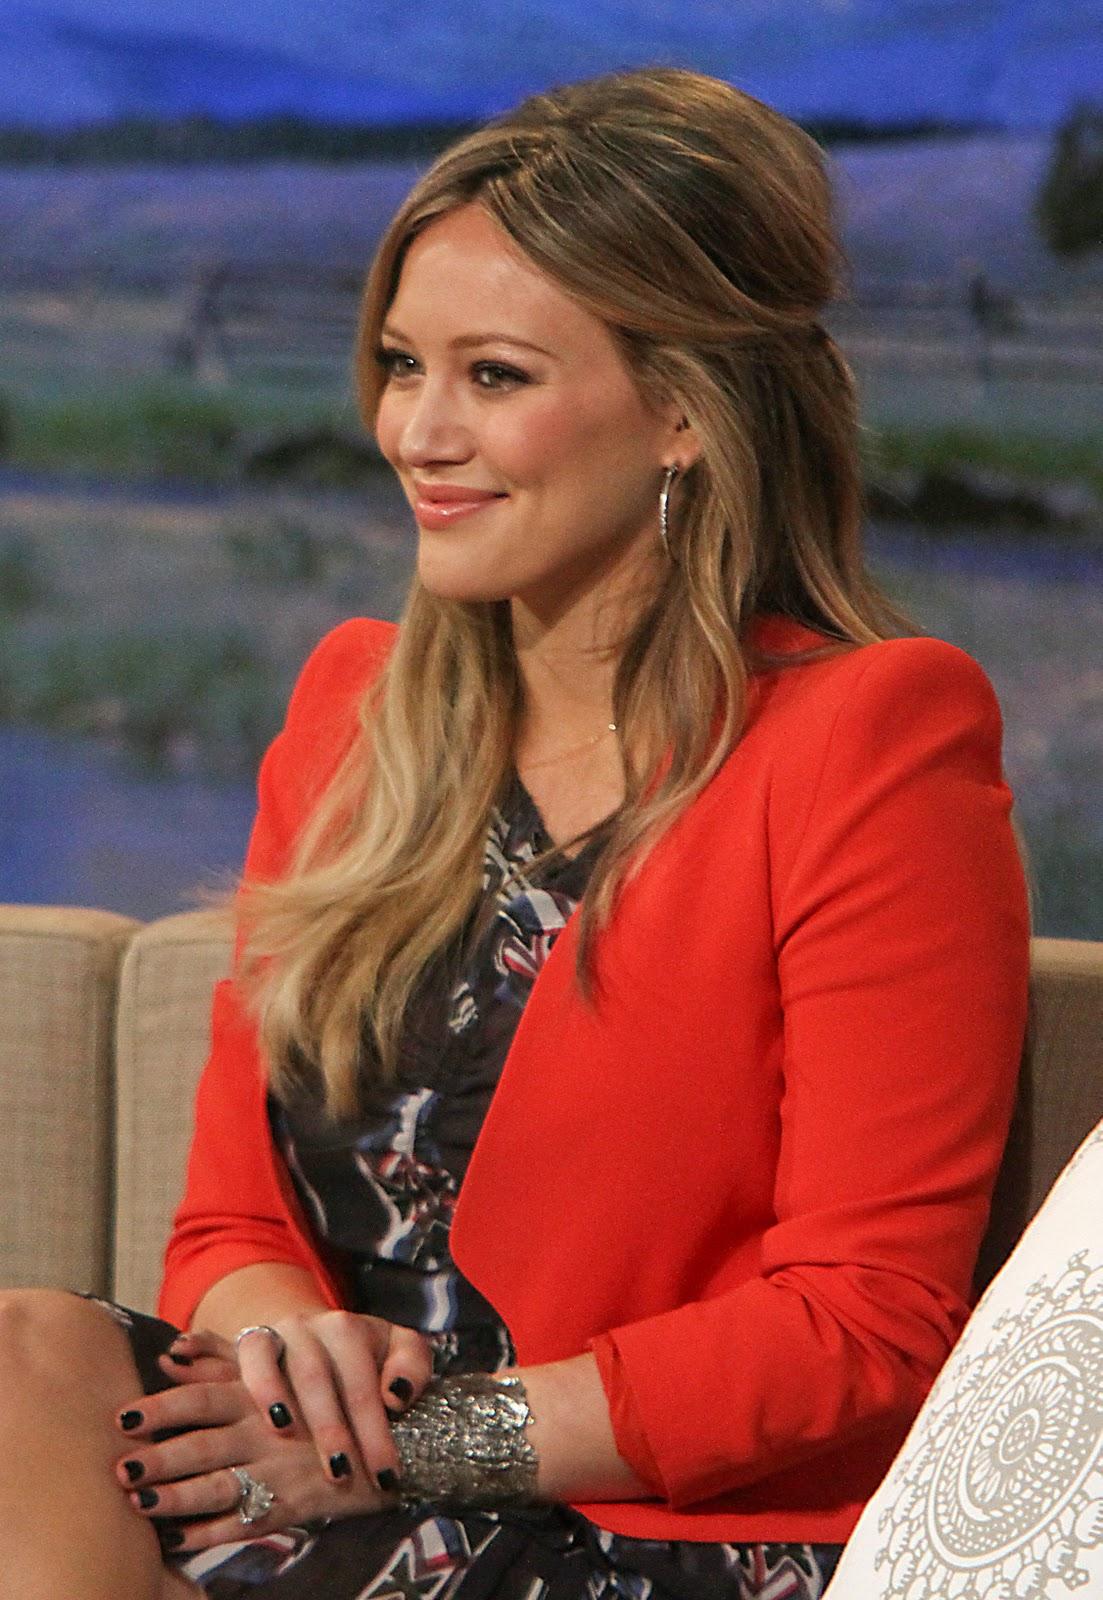 Hilary Duff On Good Morning America In Nyc  Disney Star -9813